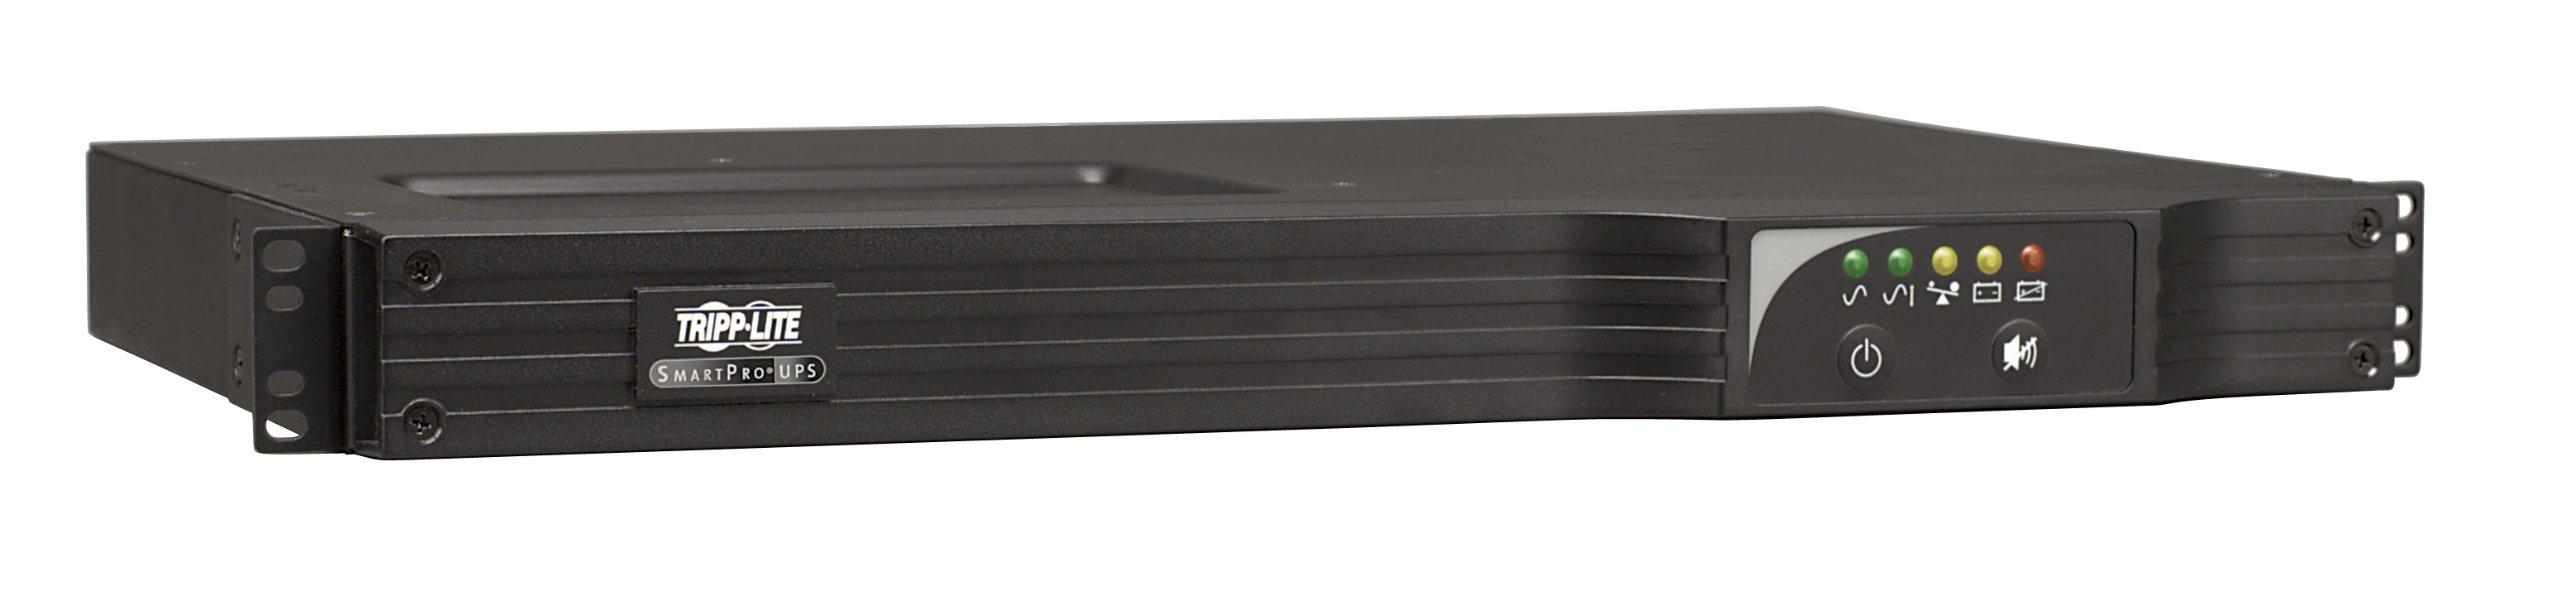 Tripp Lite 750VA Smart UPS Back Up, Sine Wave, AVR, 120V 600W Line-Interactive, 1U Rackmount, USB, DB9 Serial, 2 & 3 Year Warranties, $250,000 Insurance (SMART750RM1U) by Tripp Lite